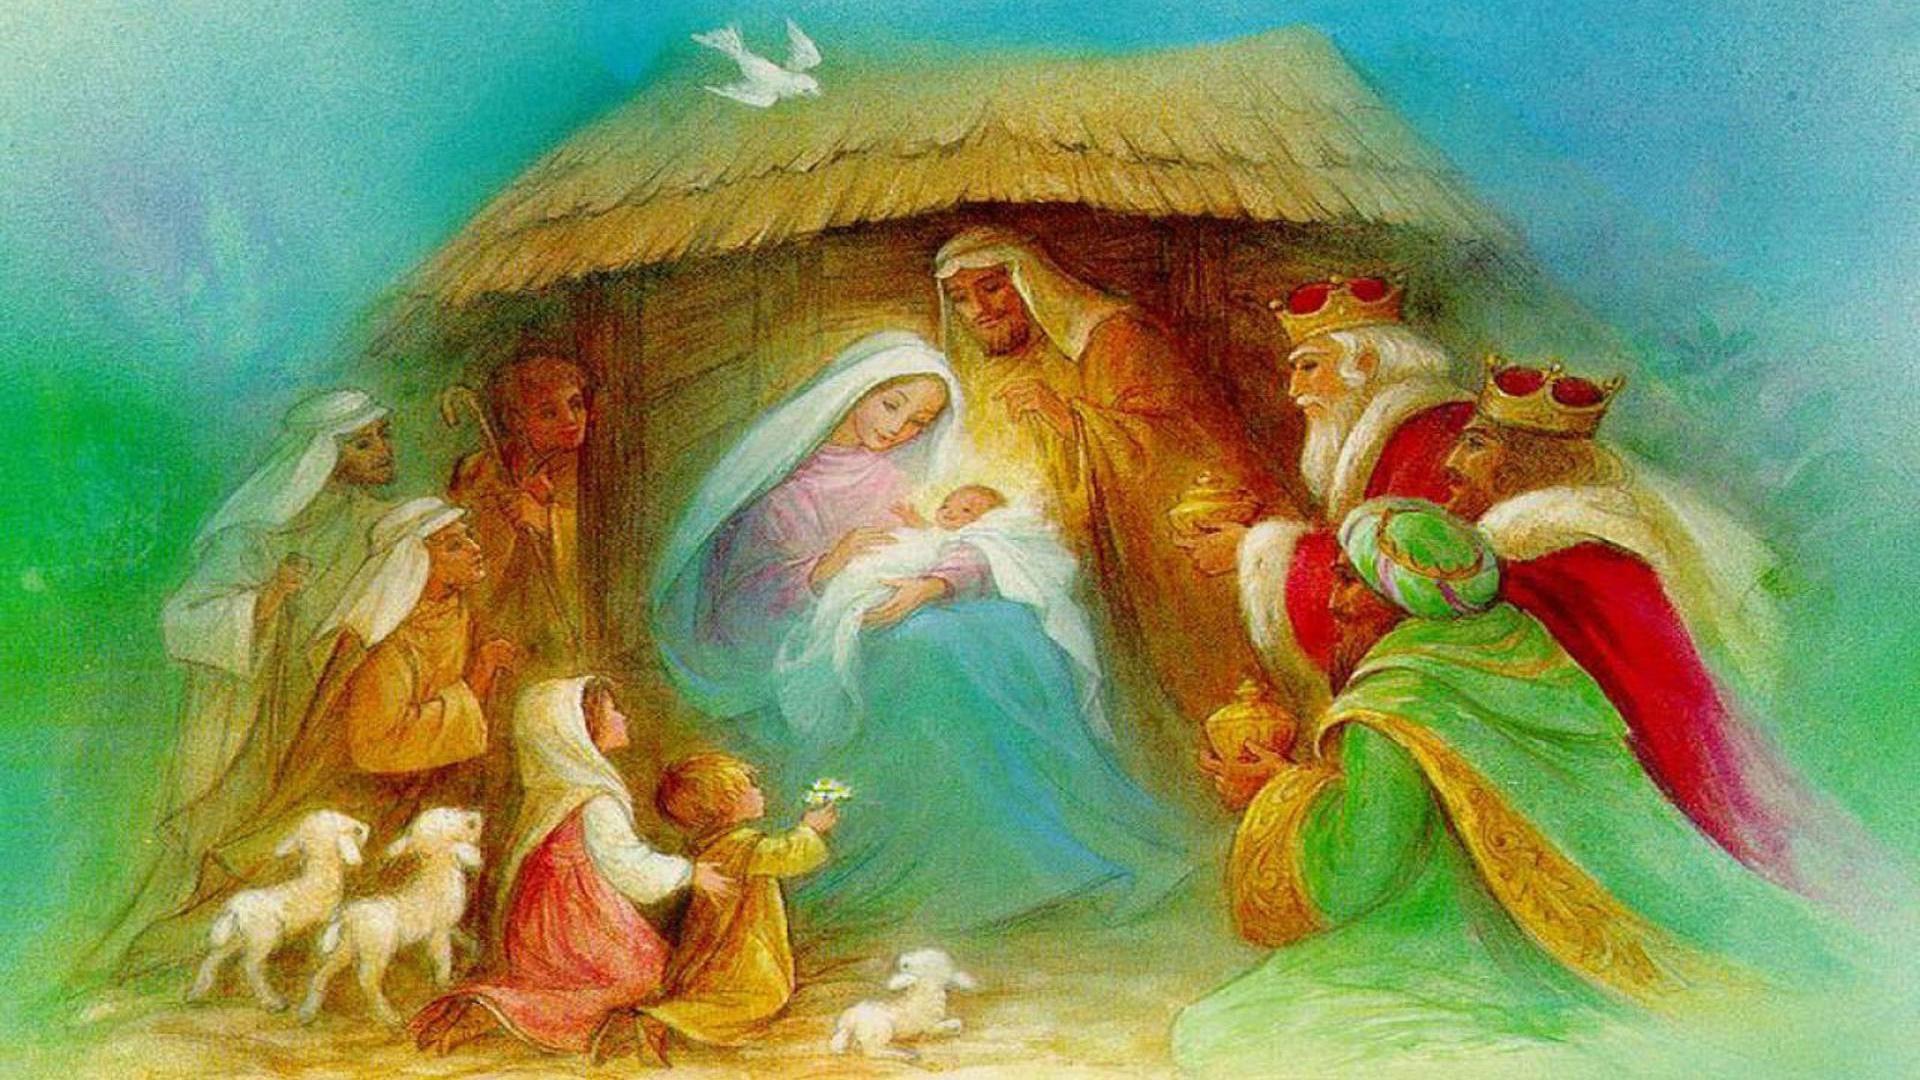 Nativity Scene Wallpaper ·① WallpaperTag